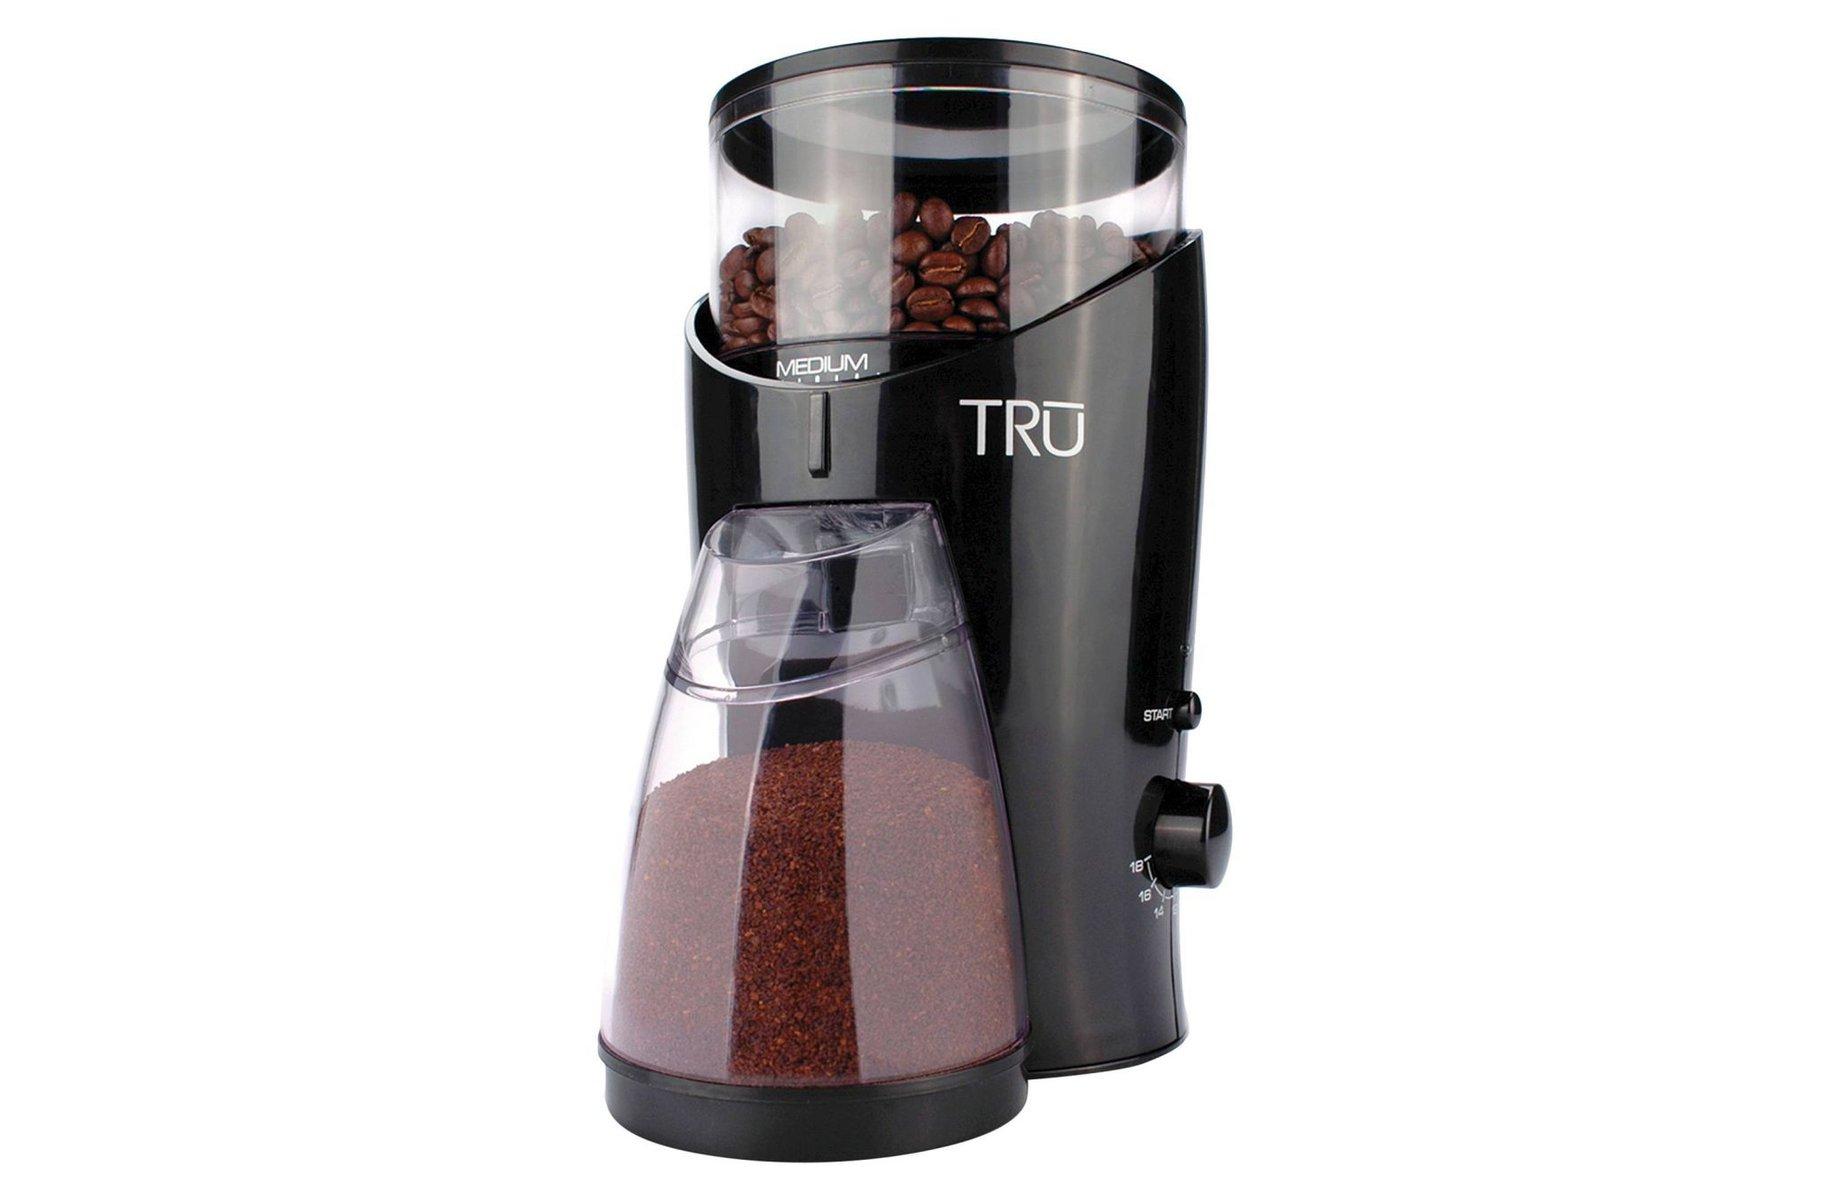 Italian Coffee Maker Filter : Italian Coffee Maker Target. Awards. Pour. 2 Cup Coffee Filter Machine. Venus Espresso Coffee ...